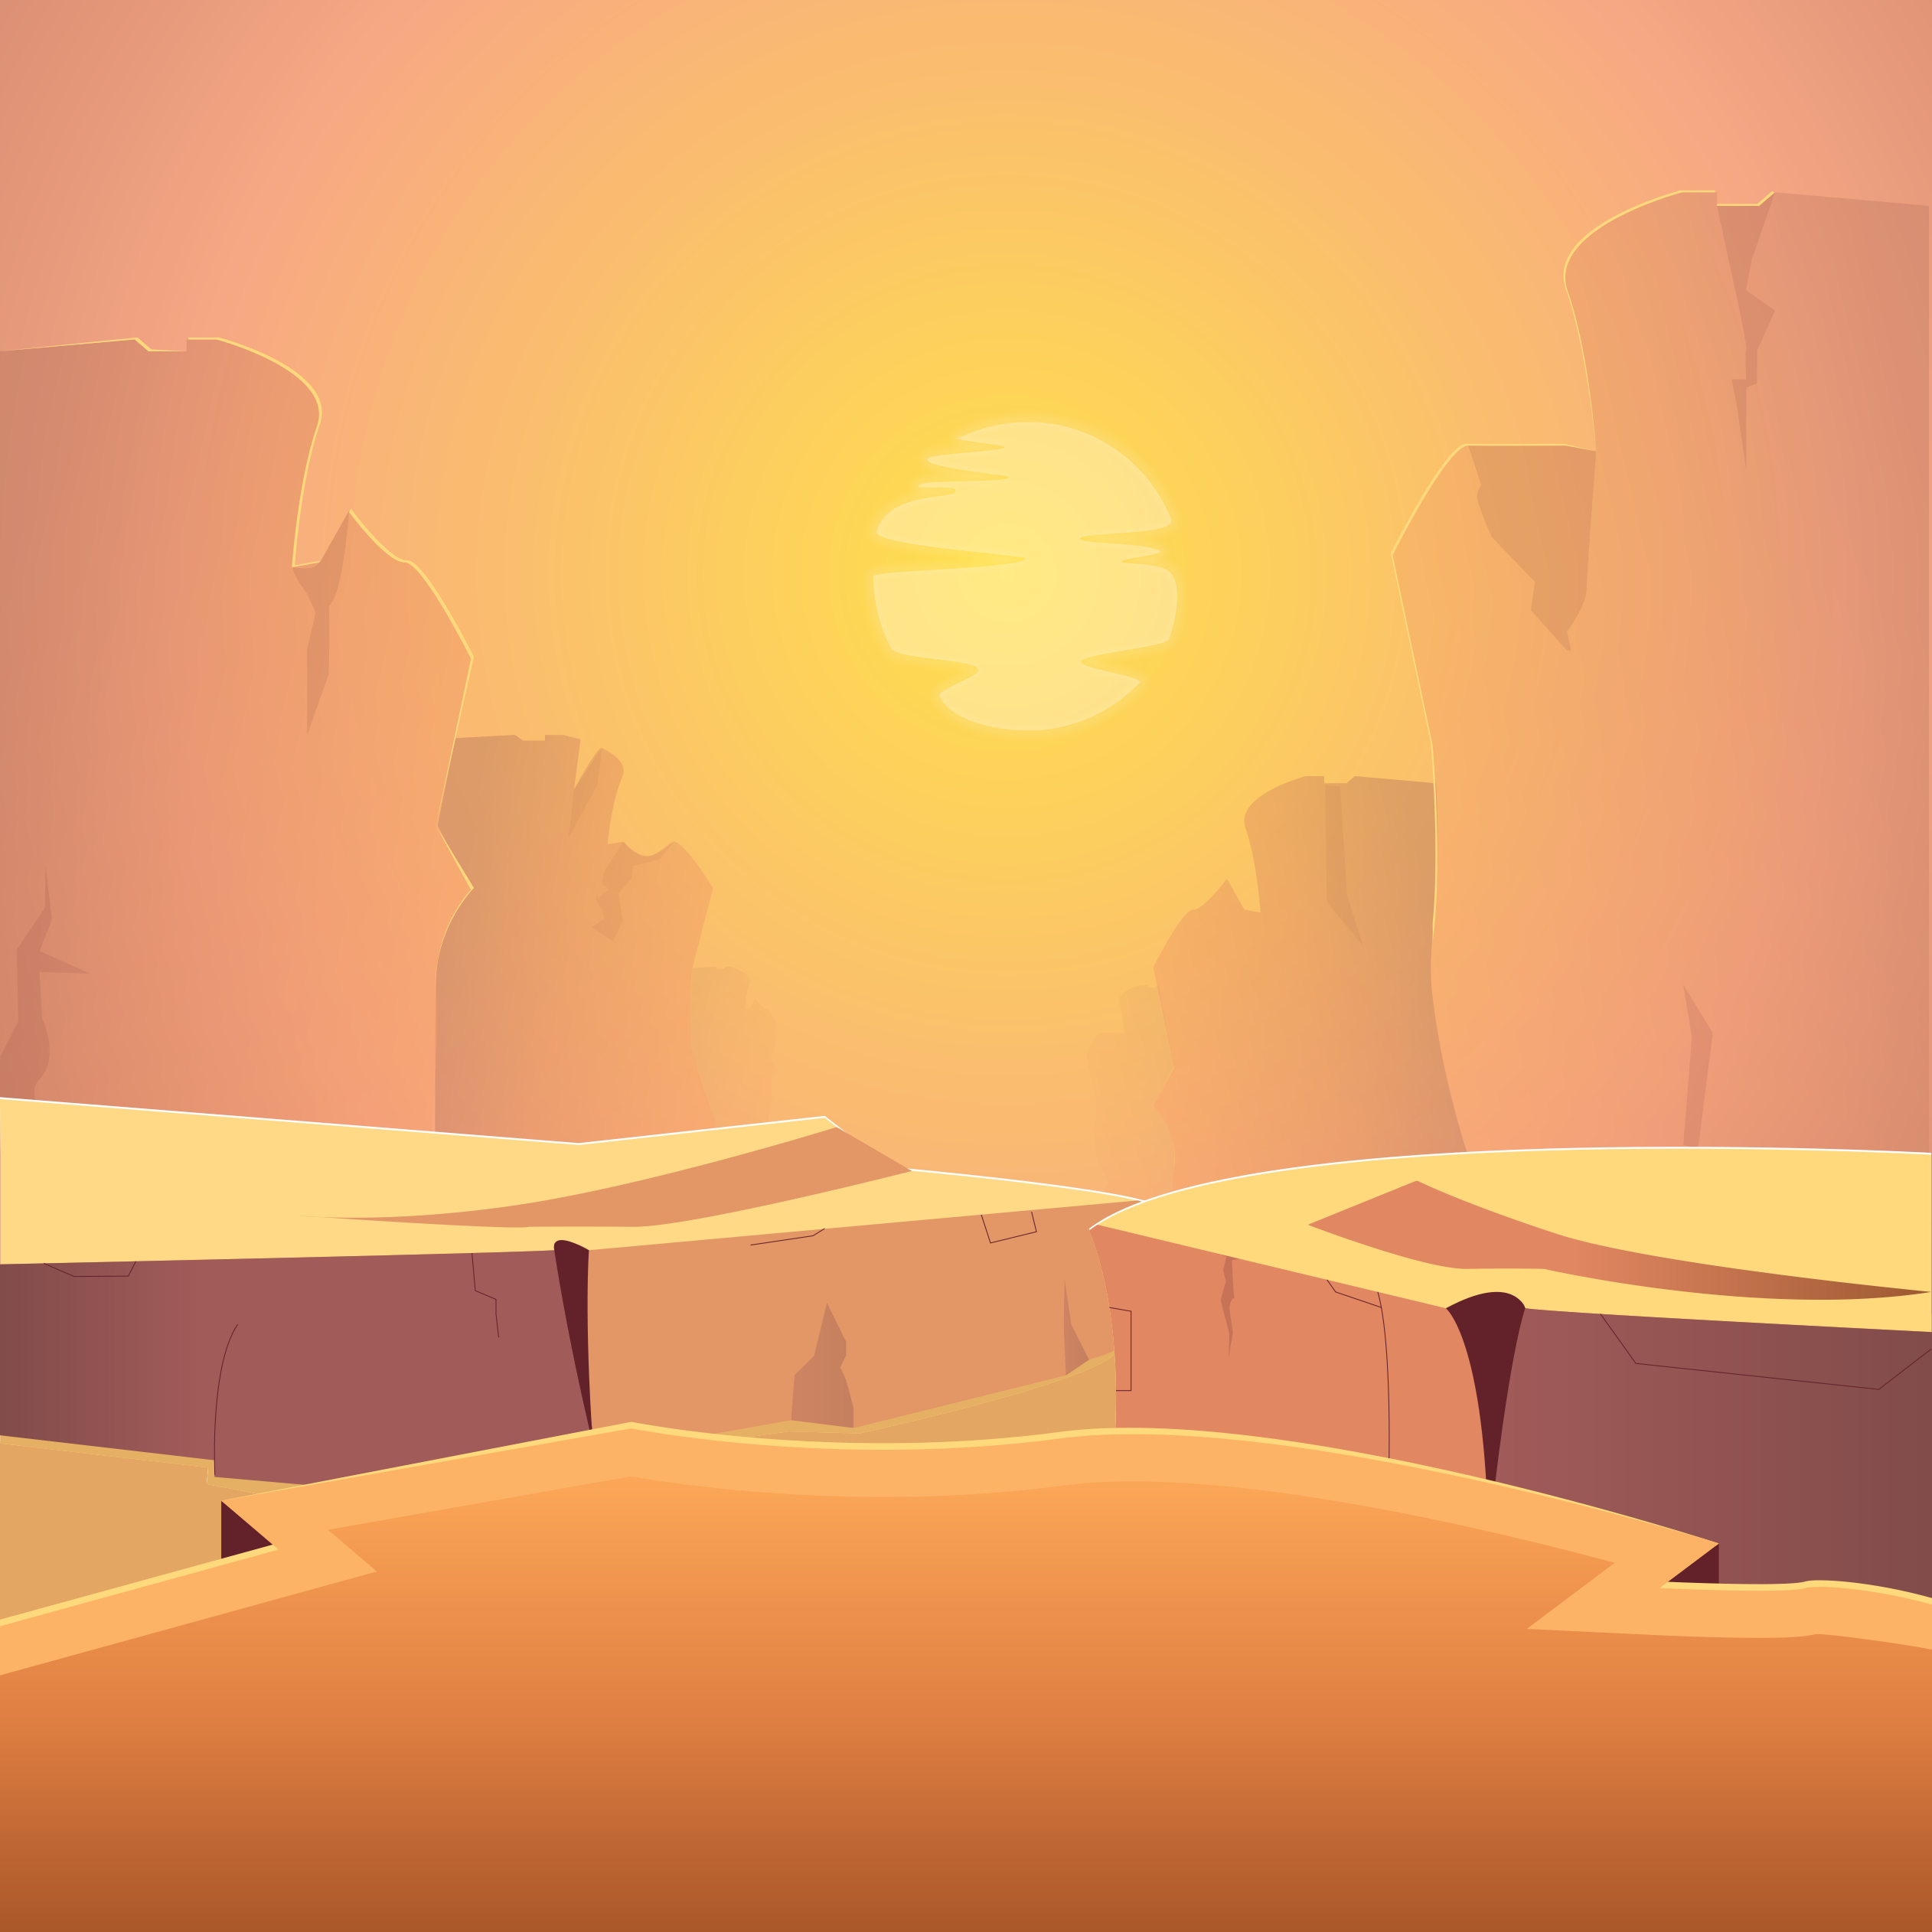 Desert Canyon Cartoon iPad Wallpaper